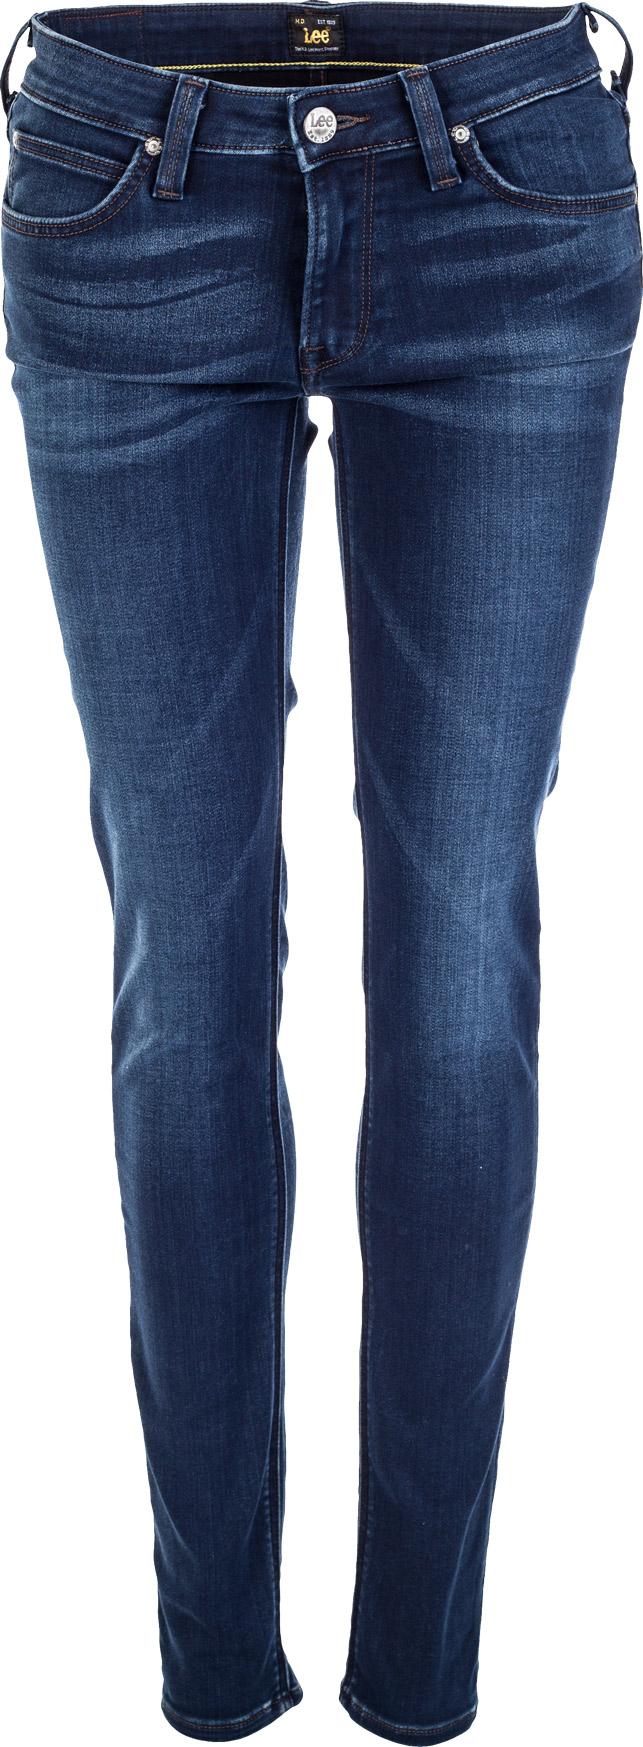 SCARLETT PITCH ROYAL - Női denim nadrág